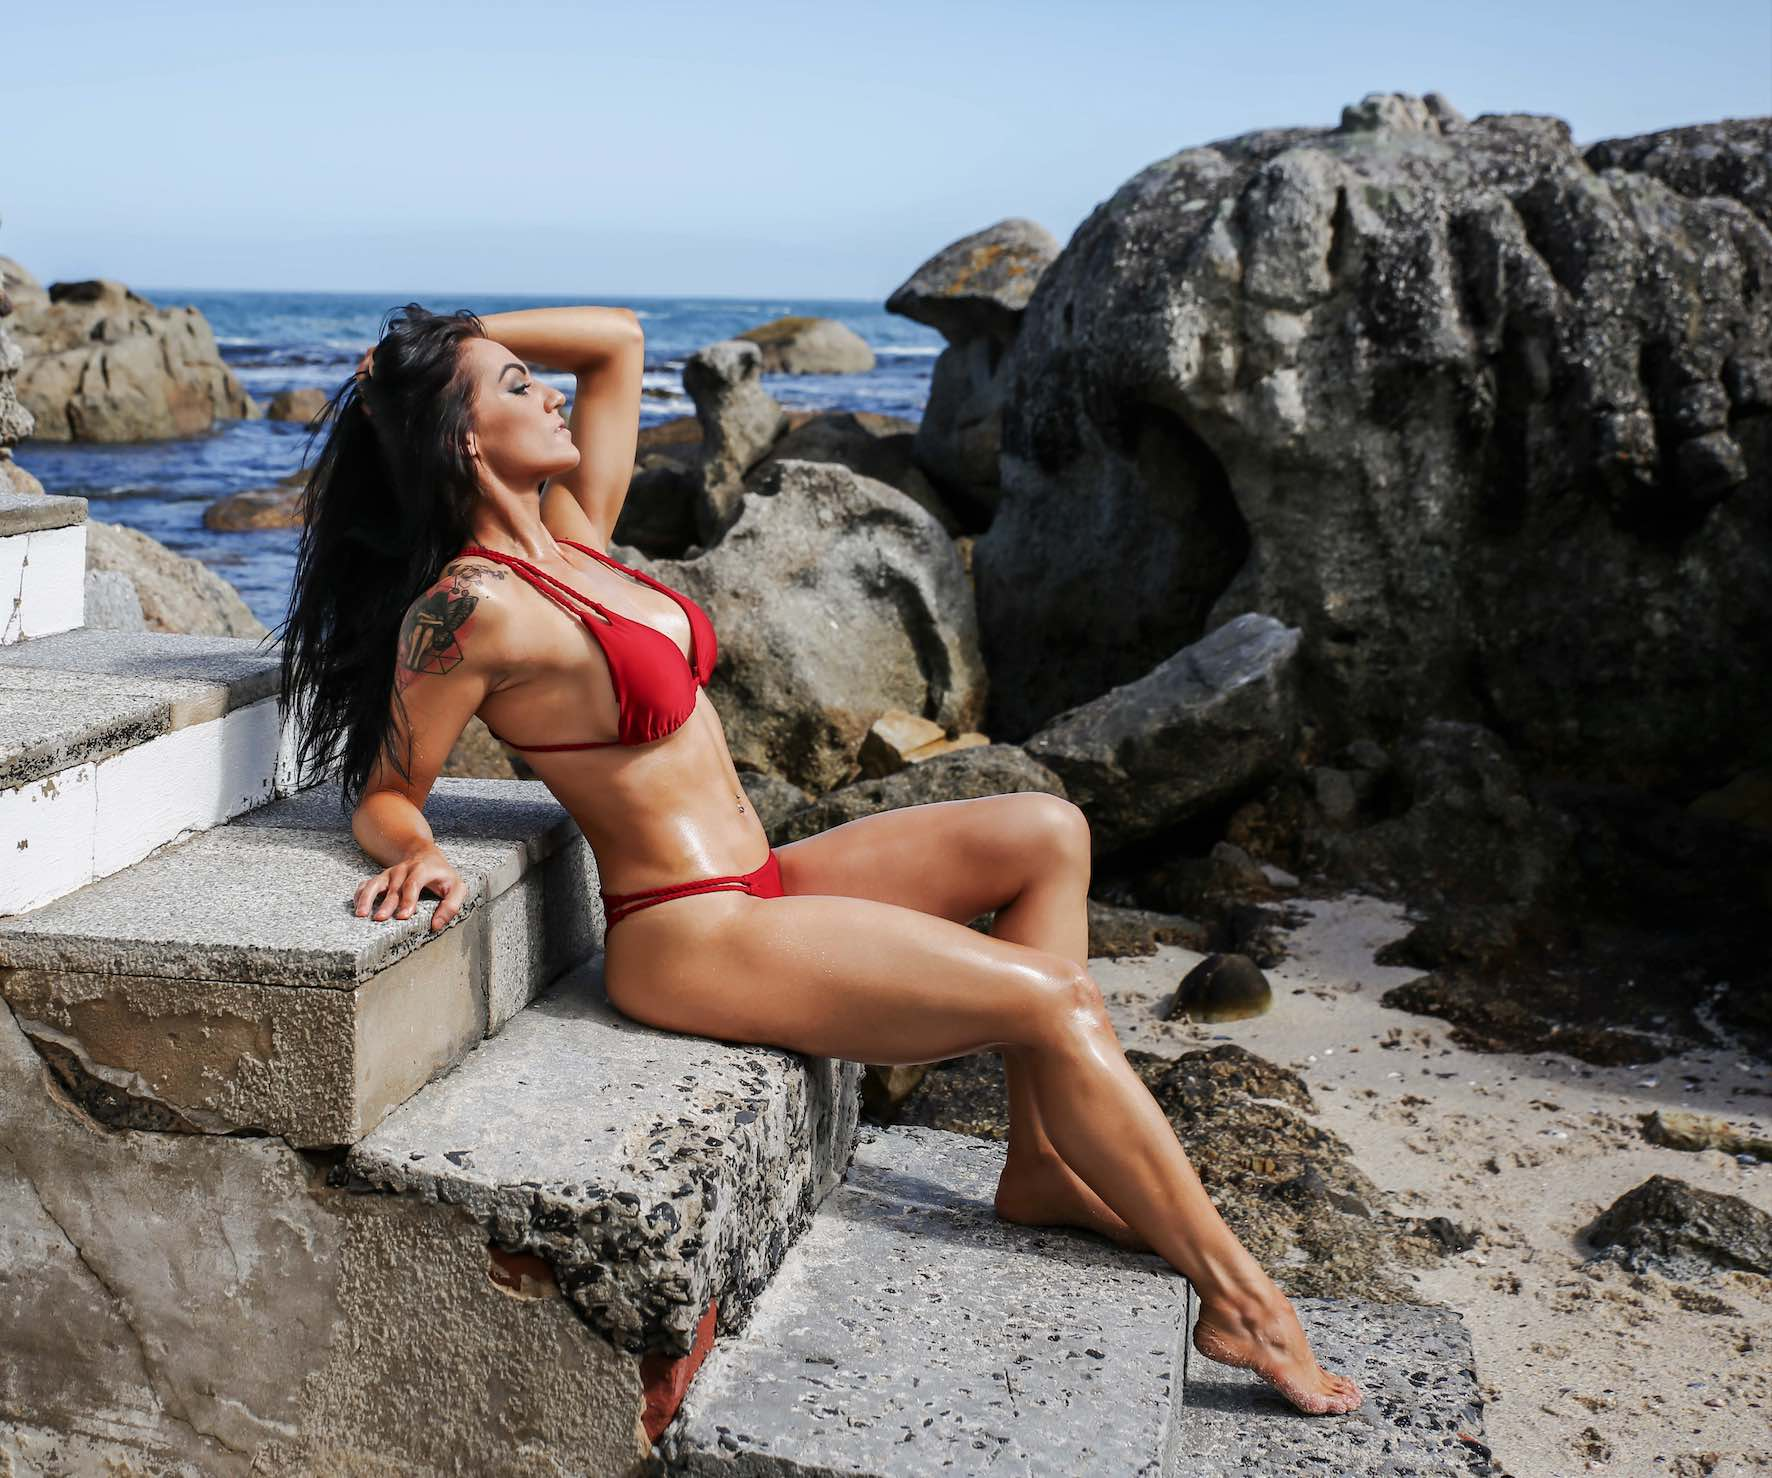 Meet Michelle Elliott as our LW Babe of the Week